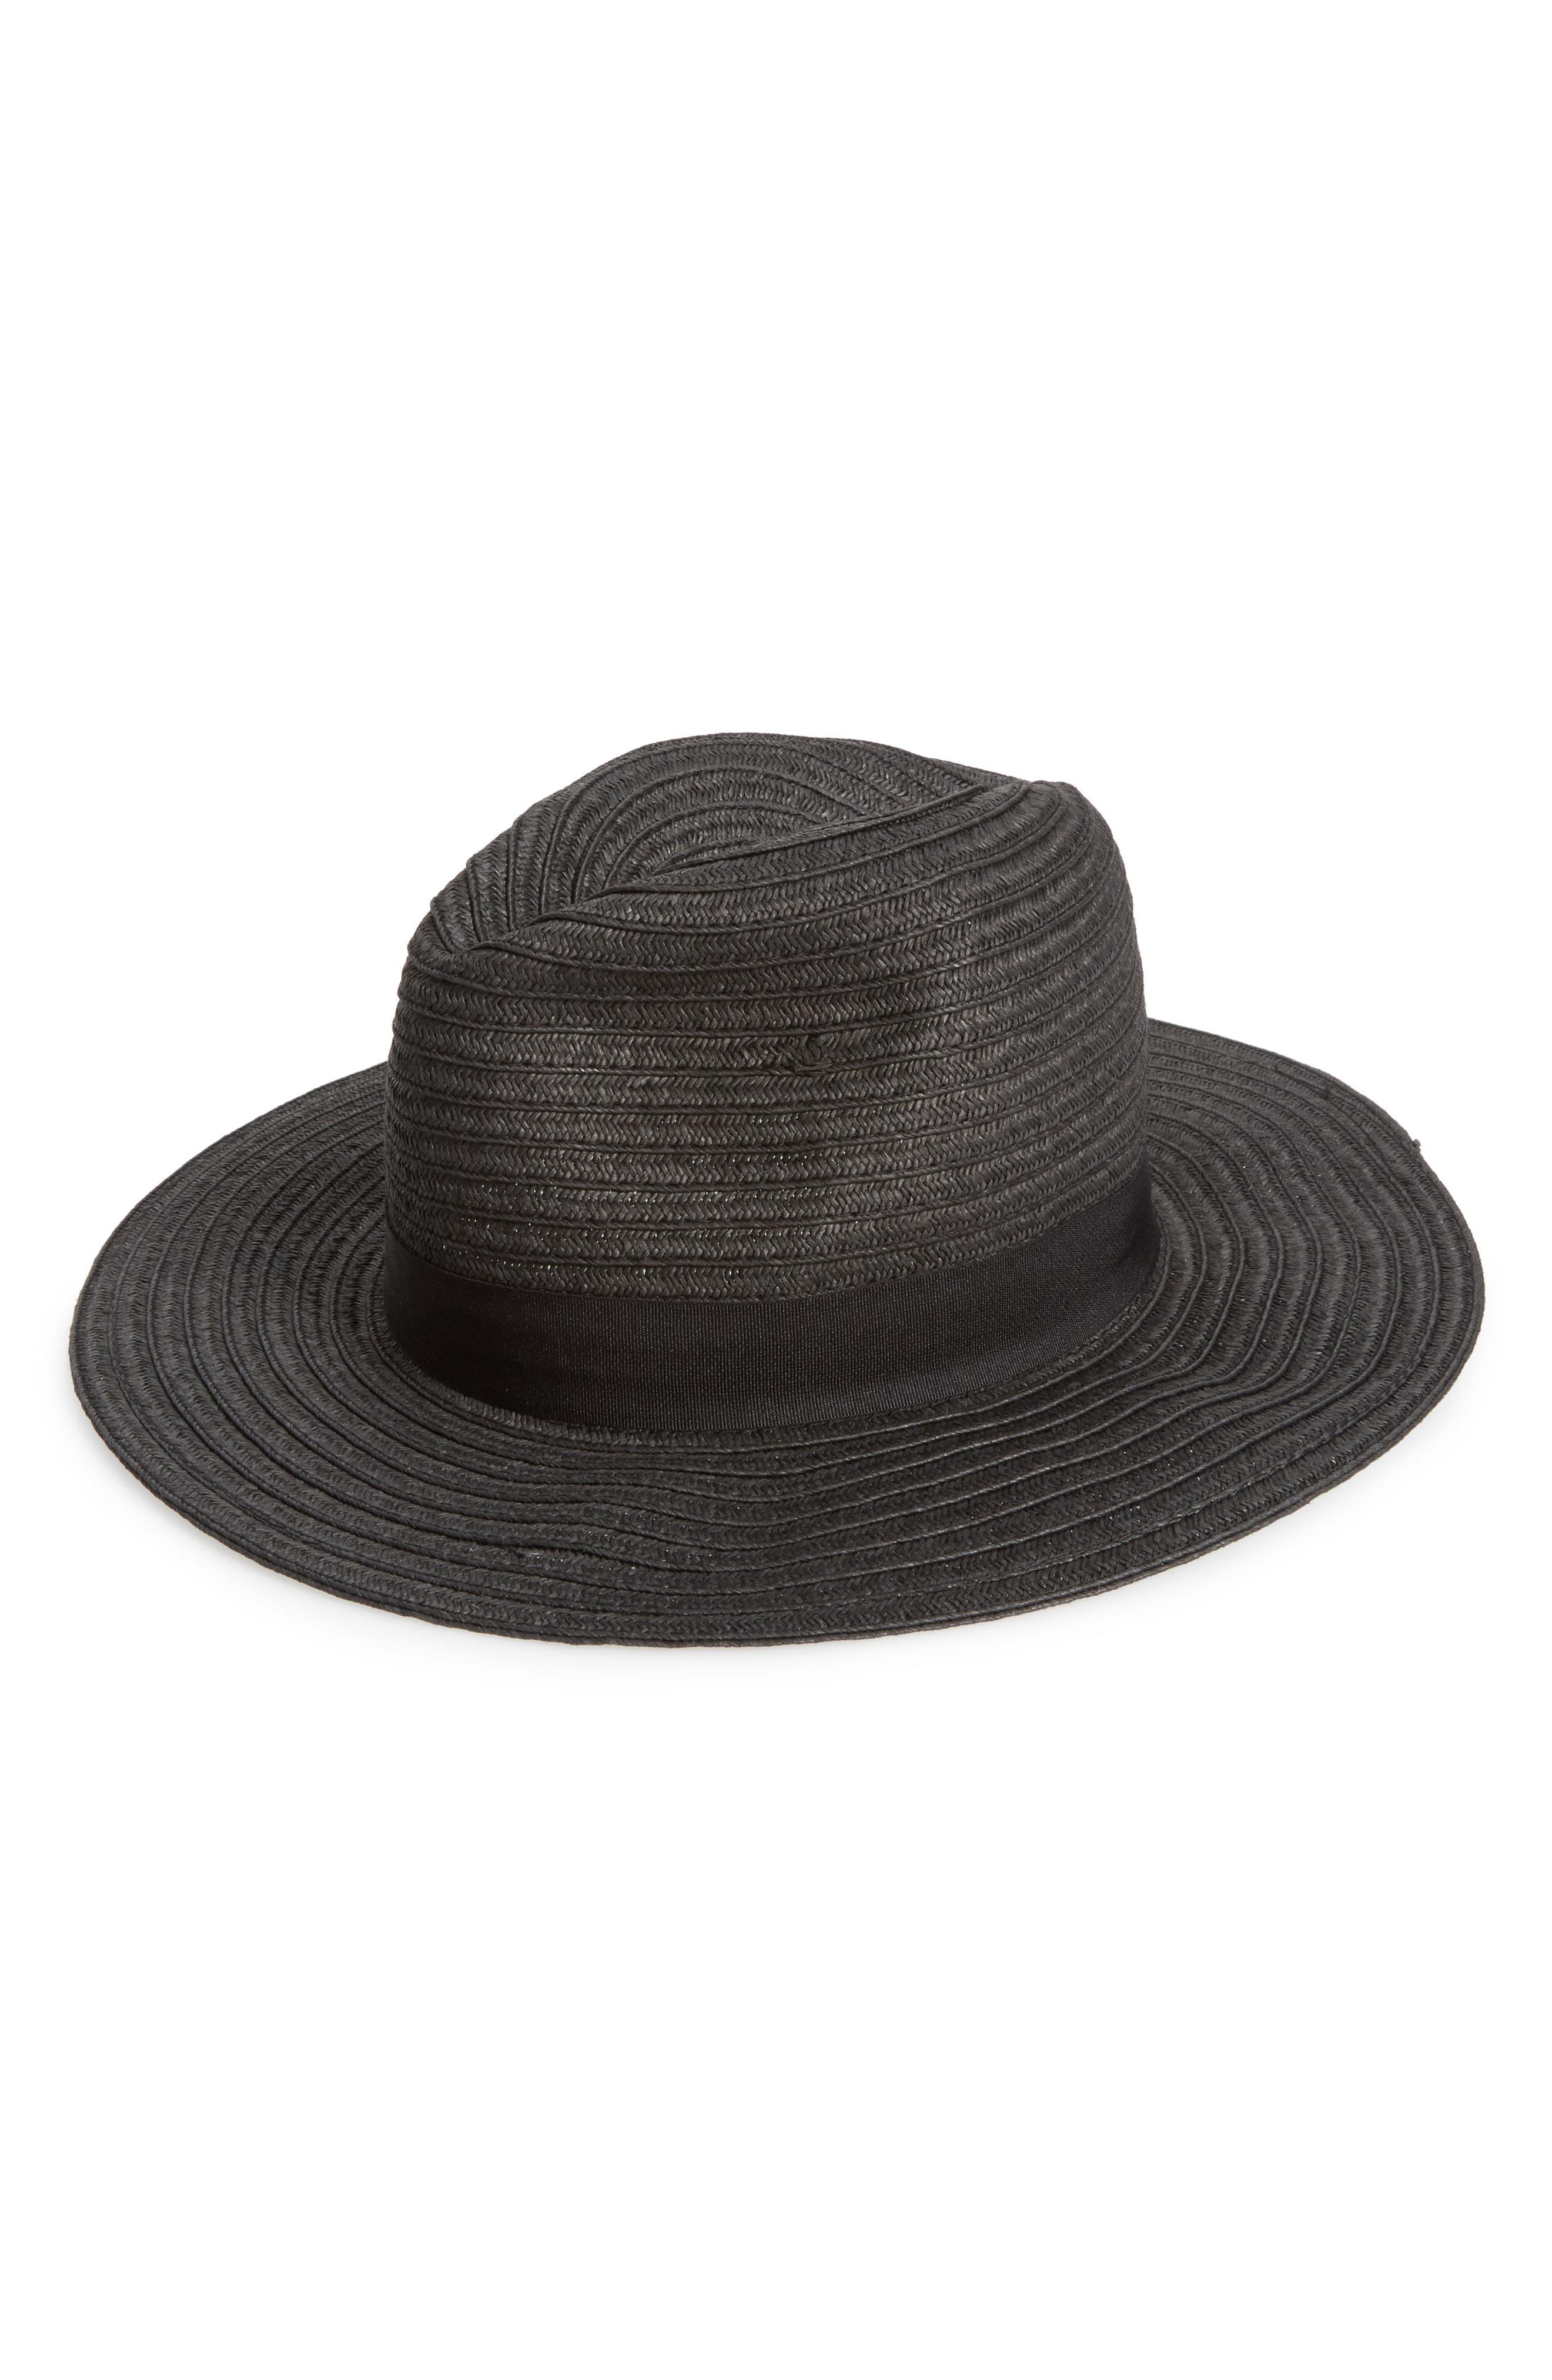 Lyst - Sole Society Panama Hat in Black cd122c4c0ec2